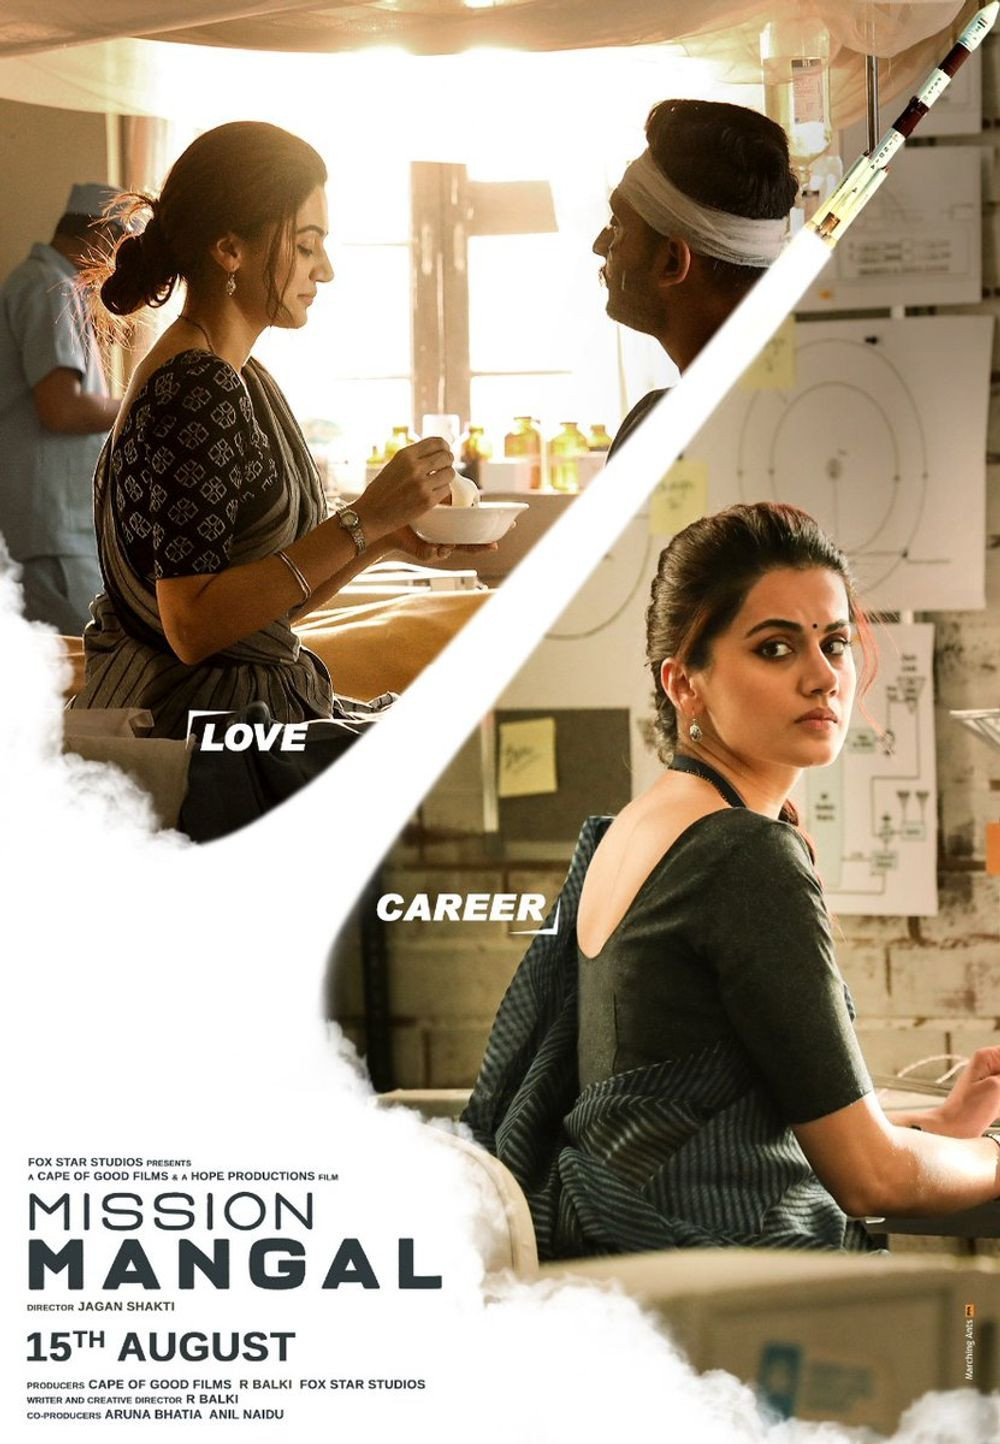 2-<p>Mission Mangal</p>